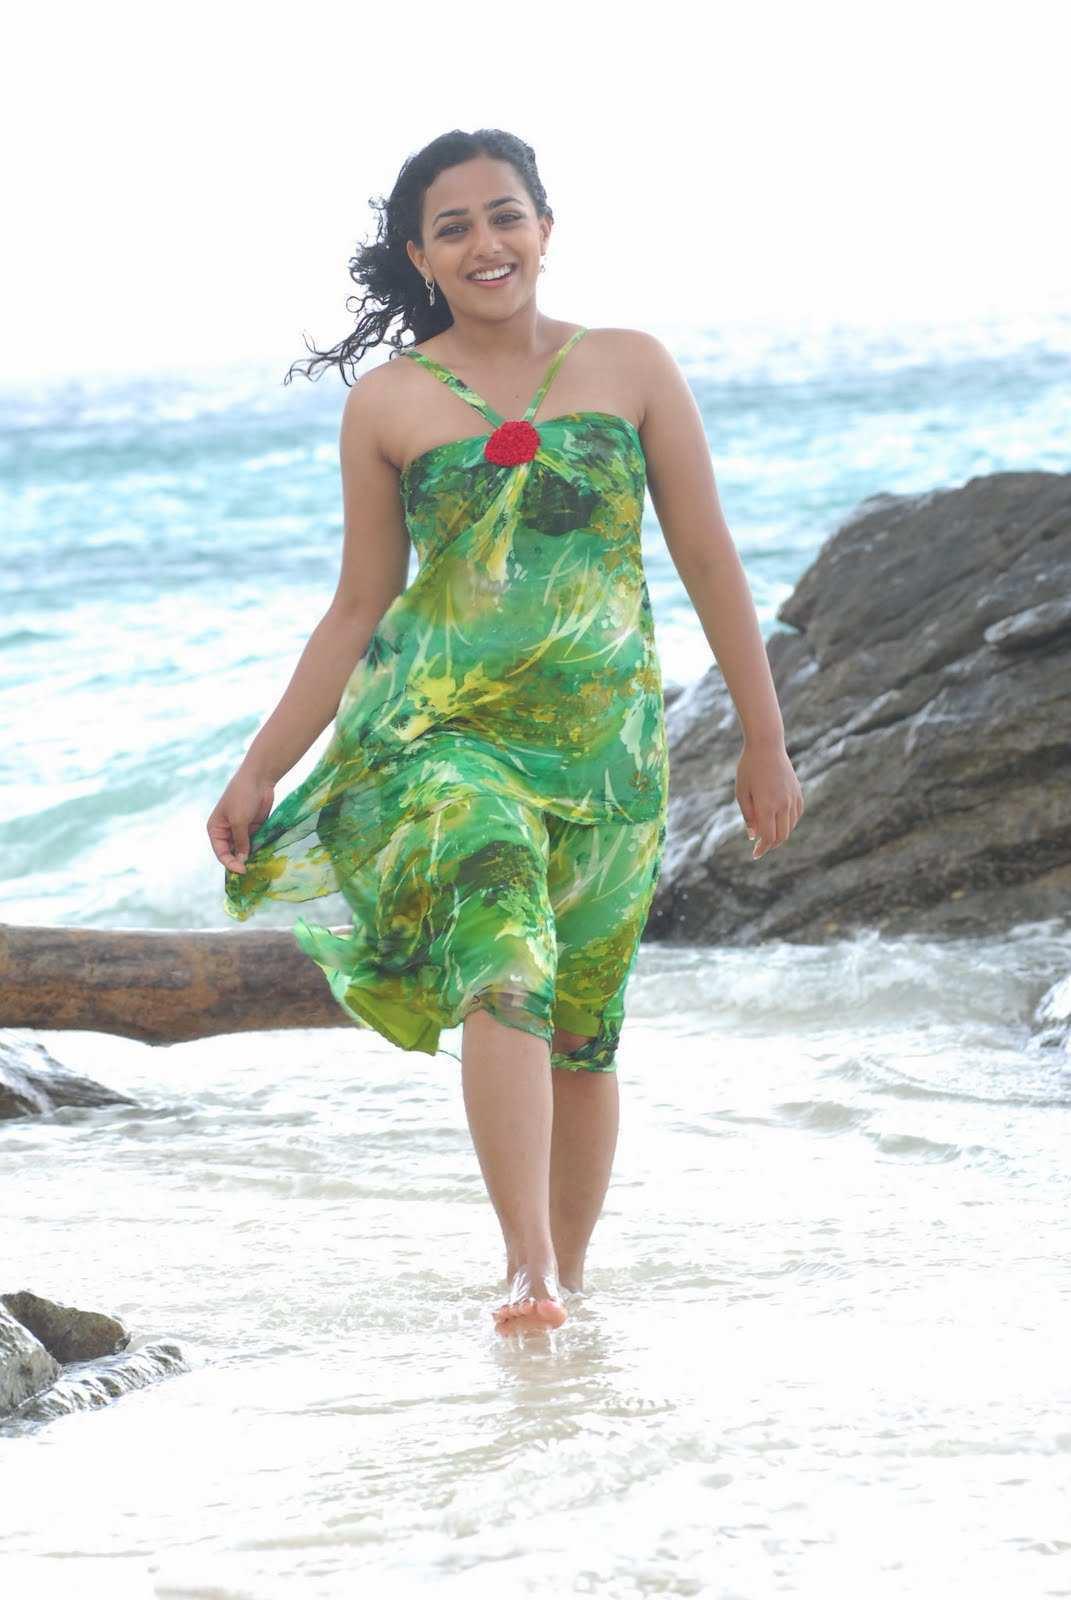 Malayalam Actress Nithya Menon Wet Hot Legs Show Photoshoot In Green Dress